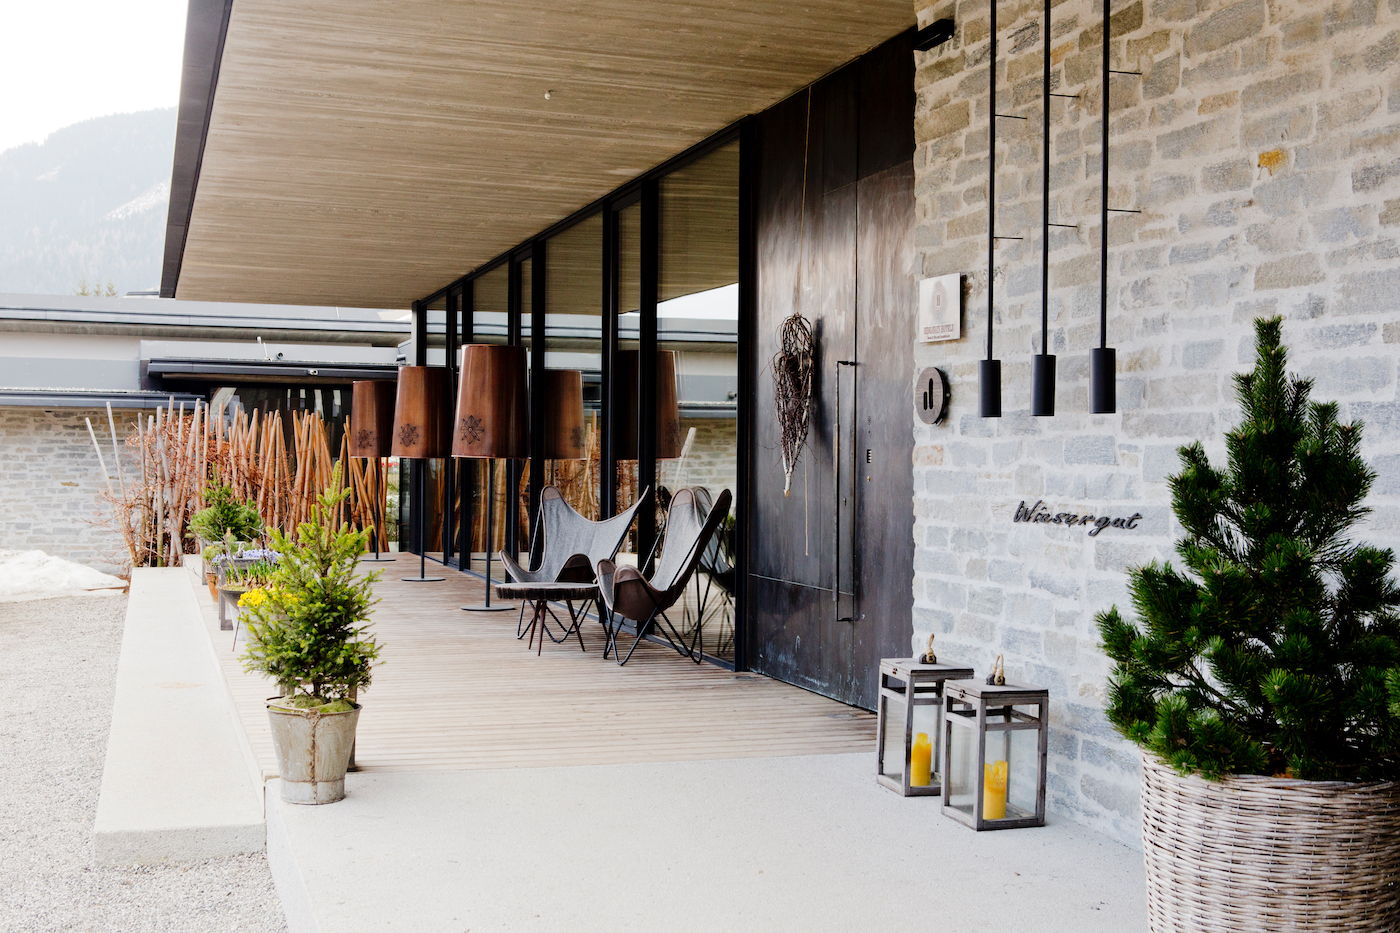 Wiesergut 5 sterne design hotel saalbach hinterglemm for Designhotel wiesergut